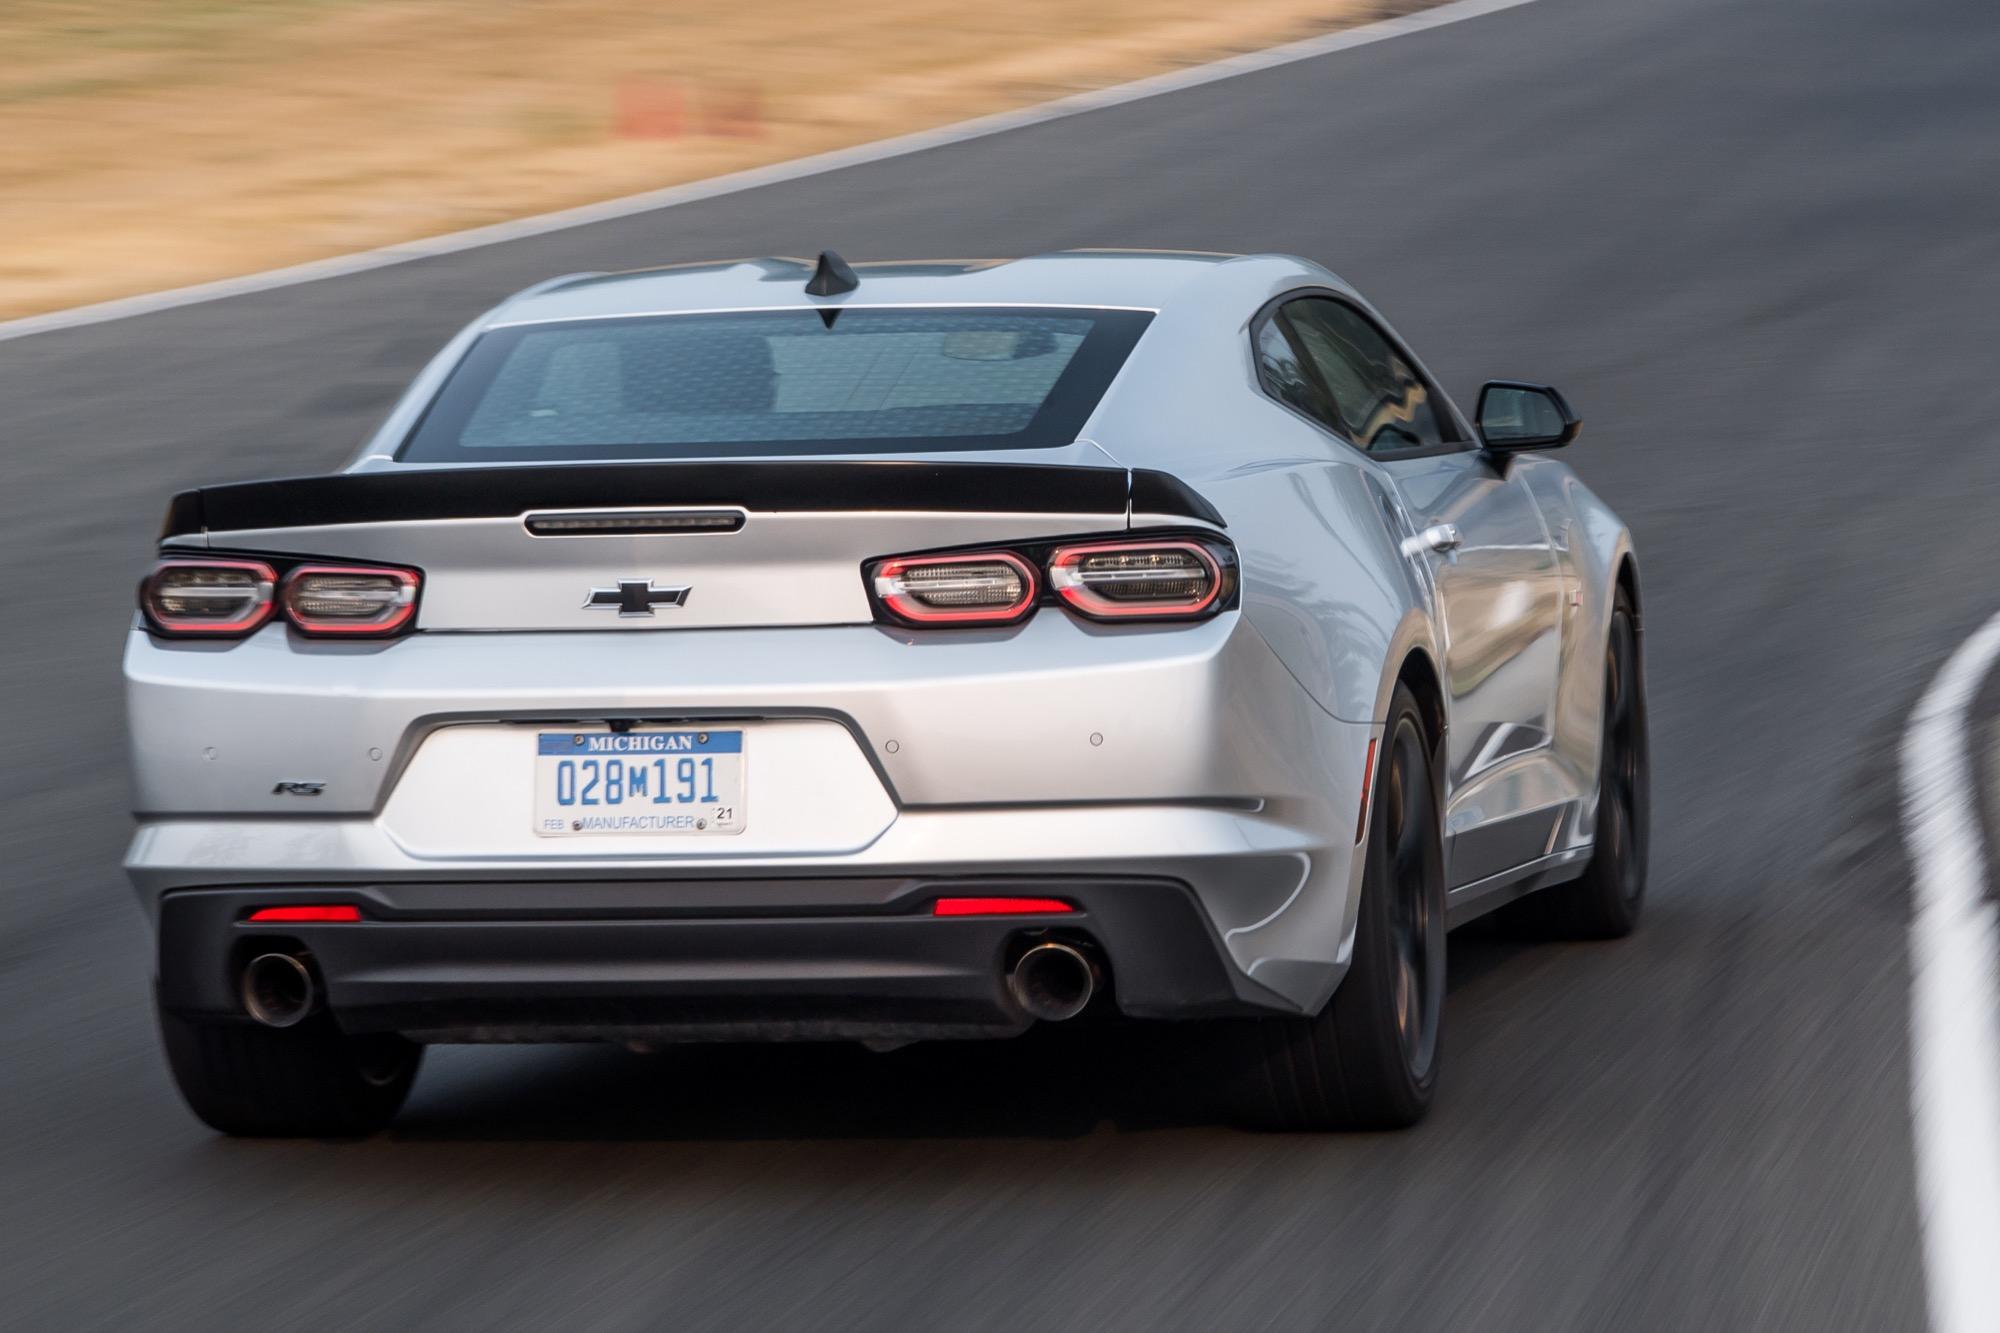 2020 - [Chevrolet] Menlo 2019-Chevrolet-Camaro-LT-Turbo-1LE-Exterior-Silver-Ice-Metallic-September-2018-Media-Drive-Seattle-006